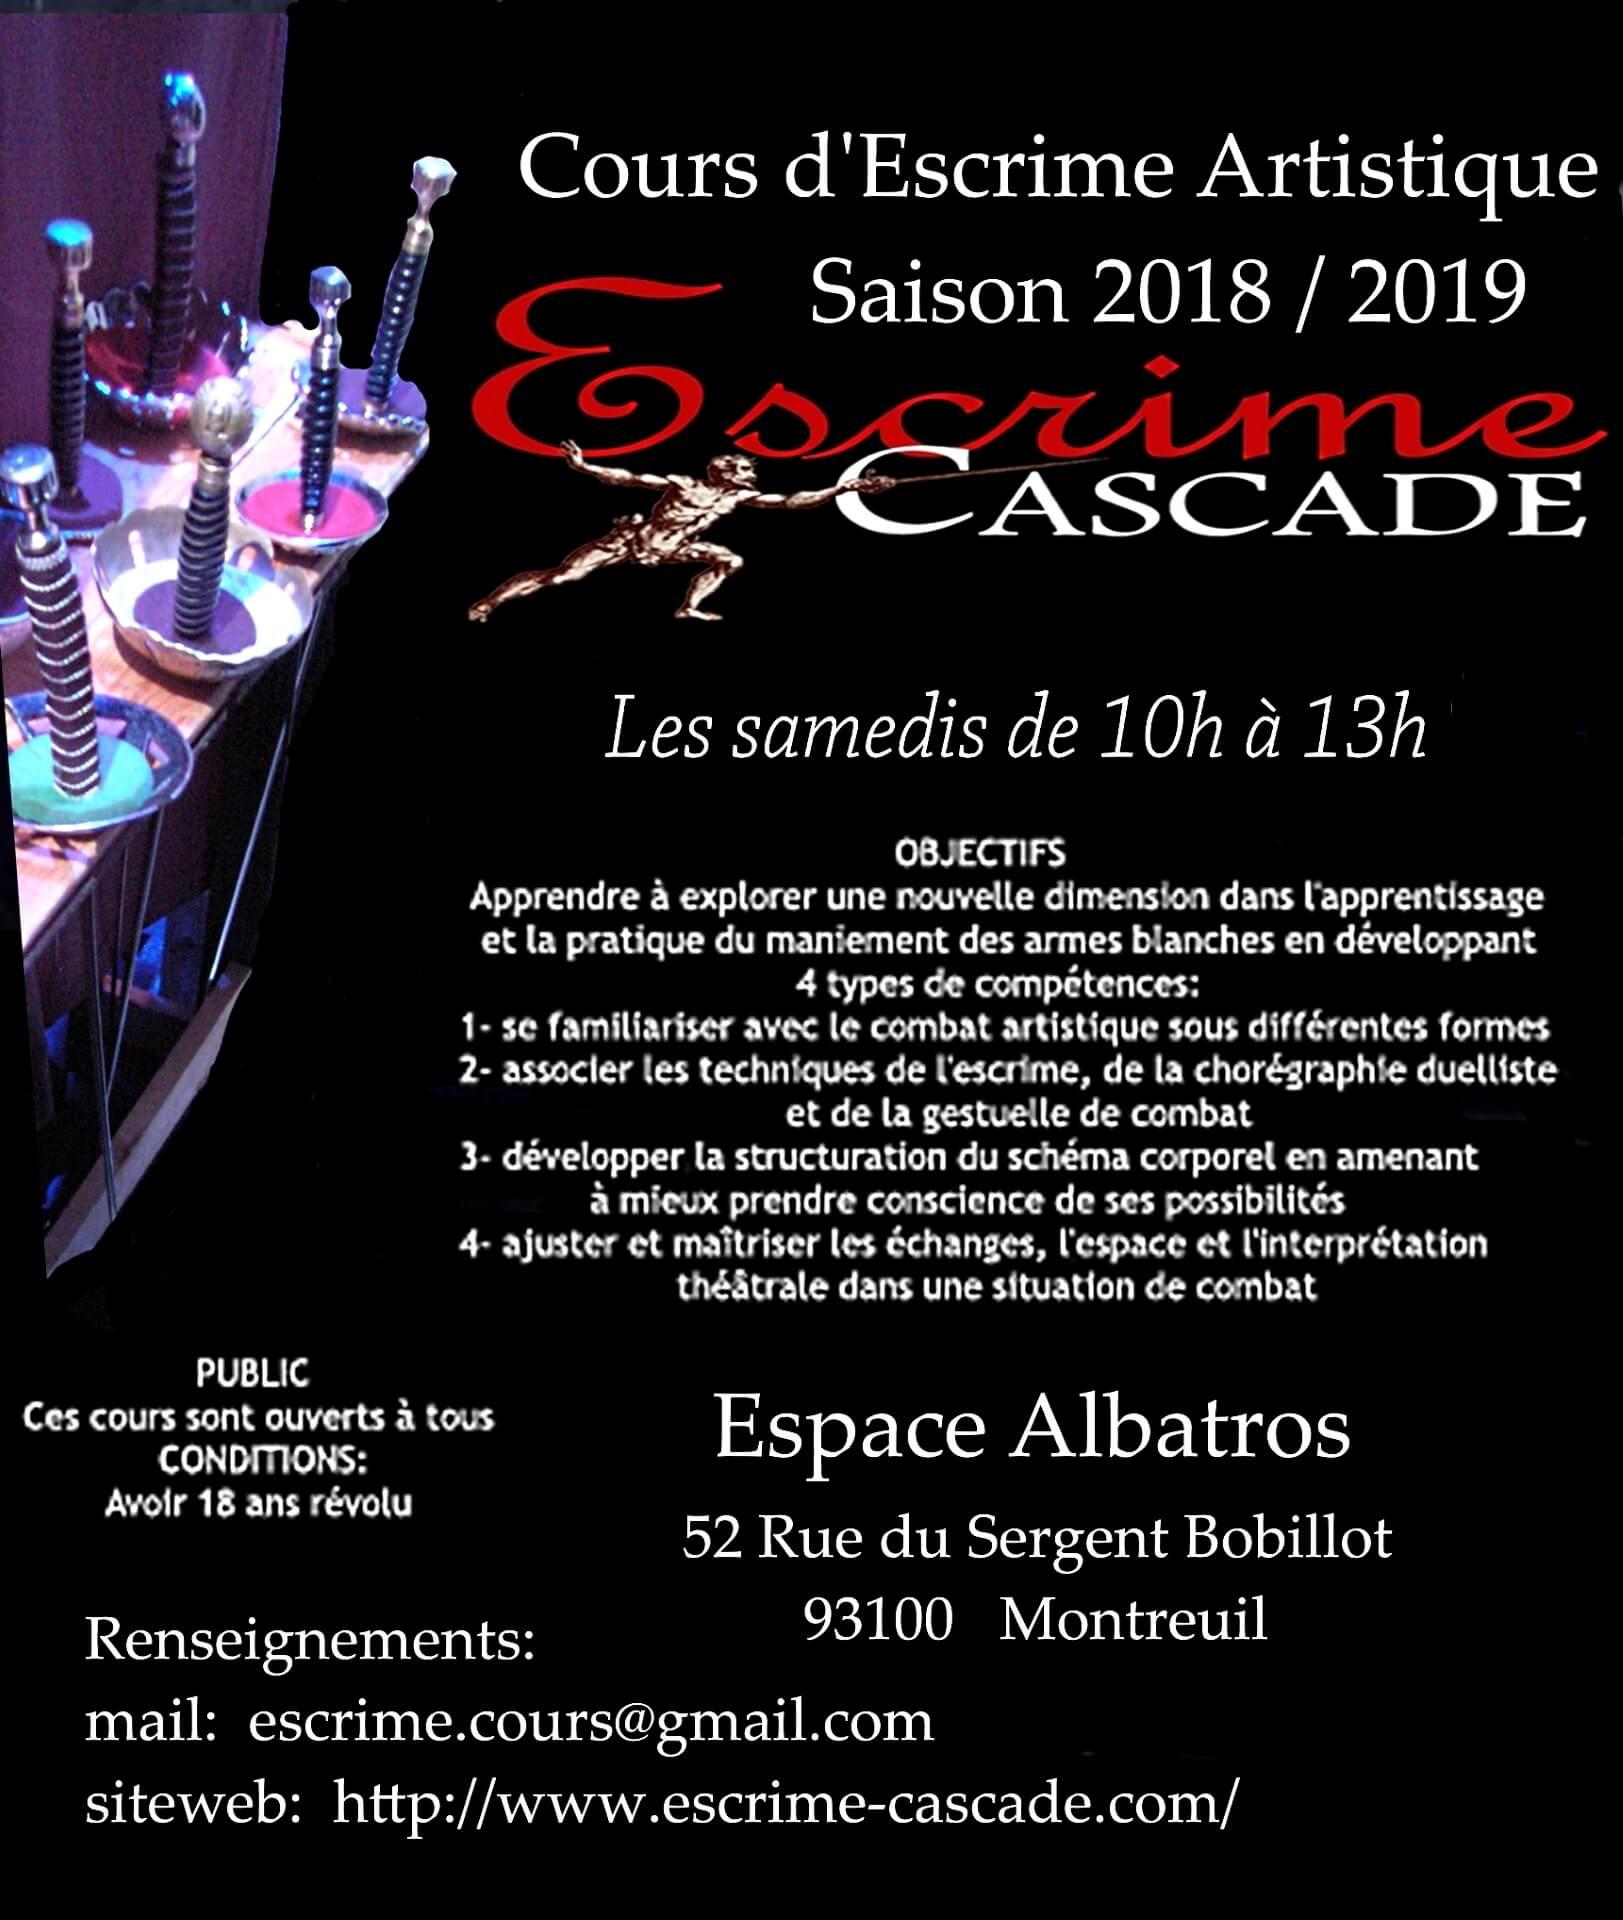 Cours-escrime-artistique.2019-Frederic Trin.jpg